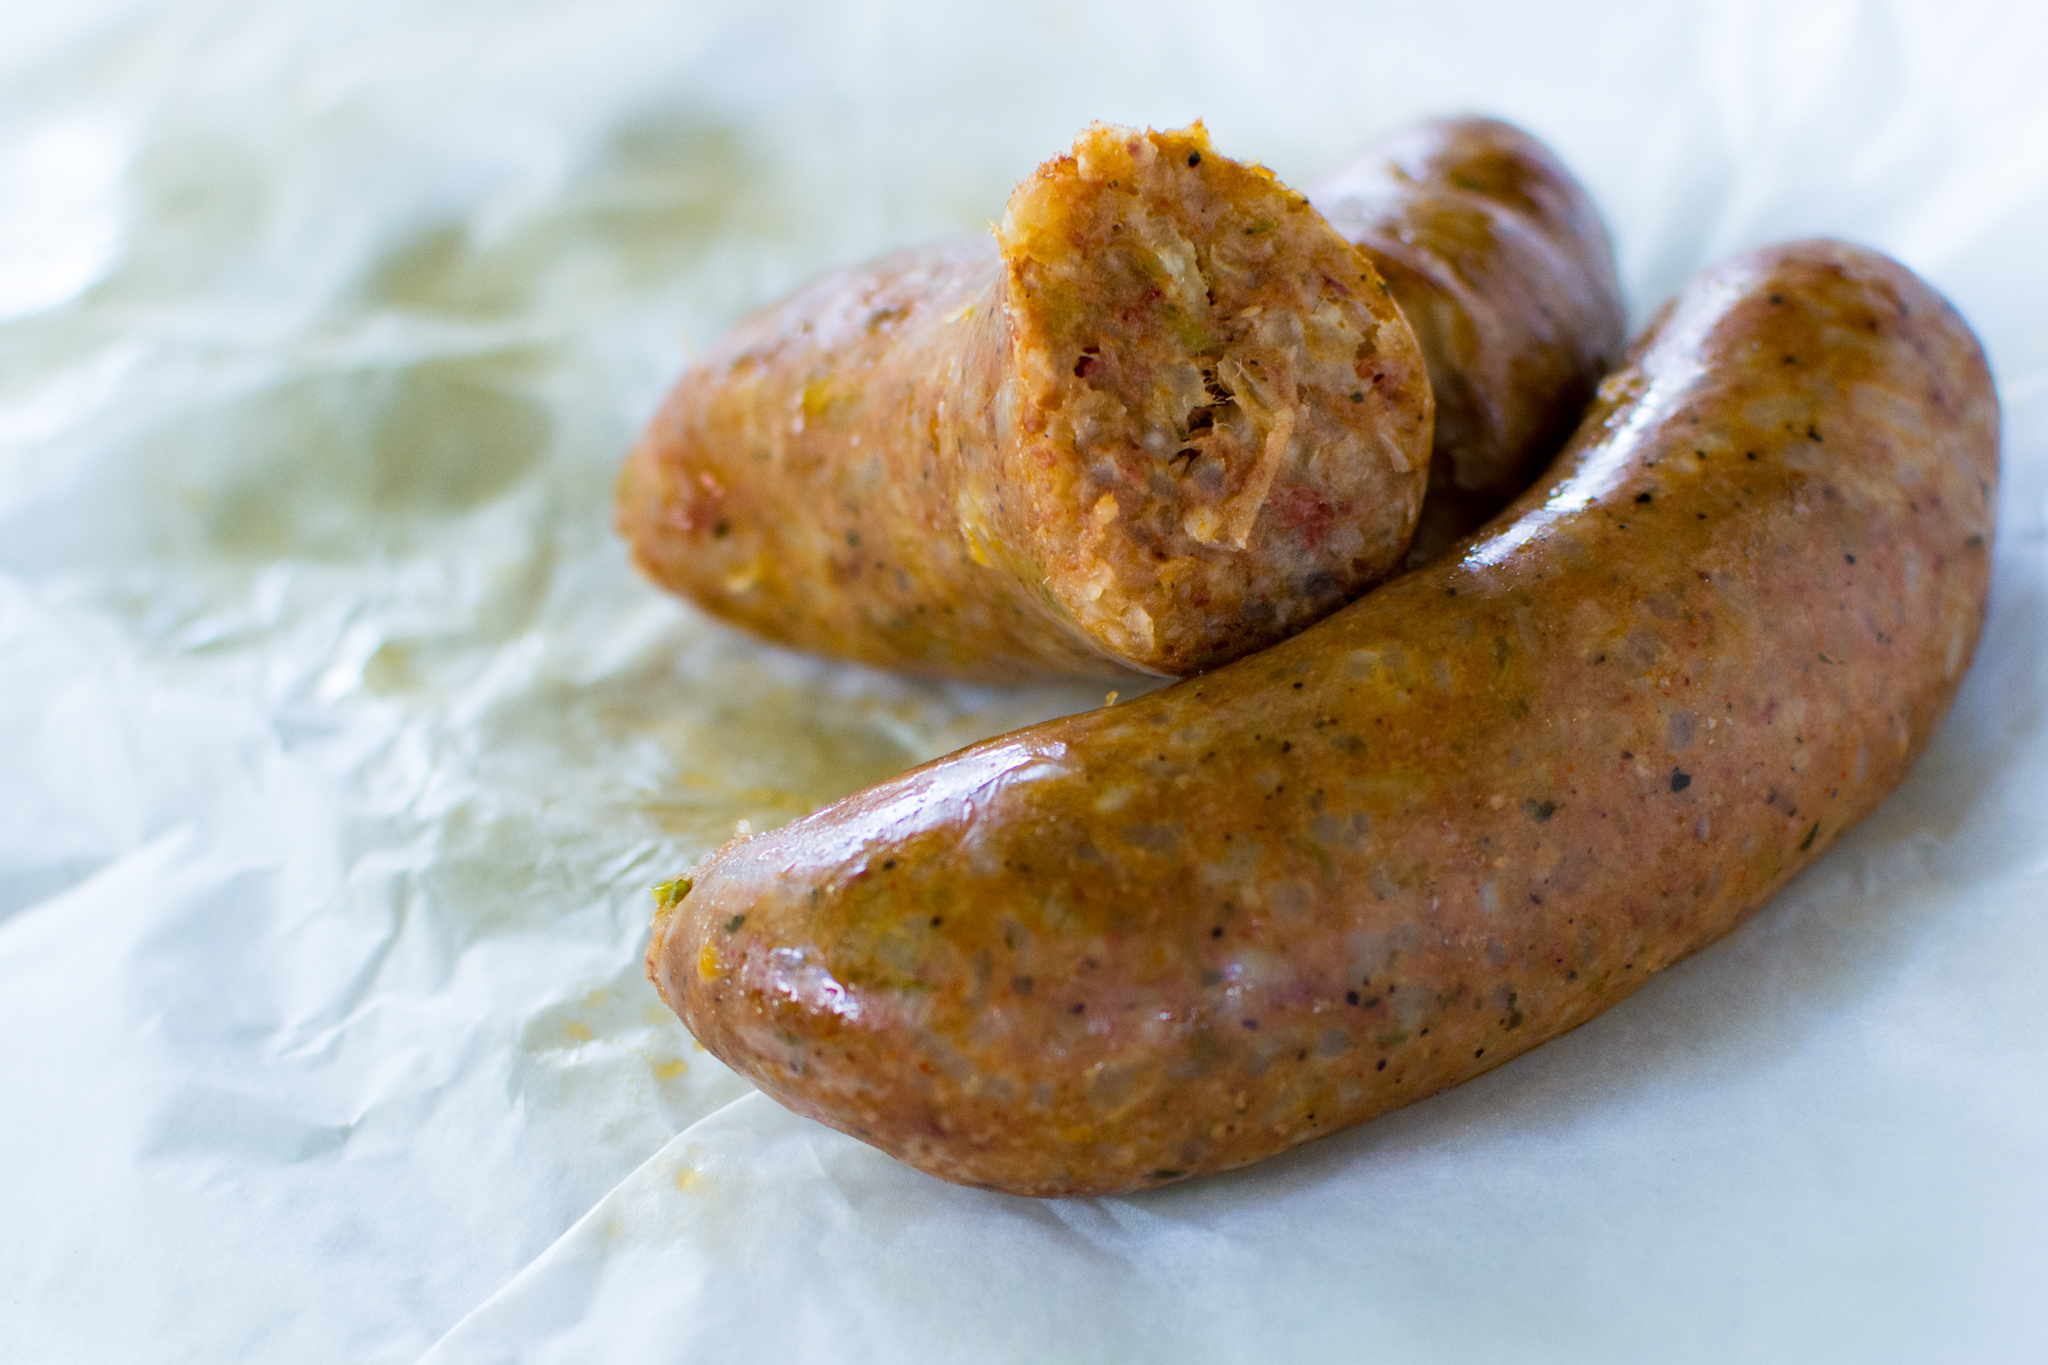 Johnson's Boucaniere Sausage